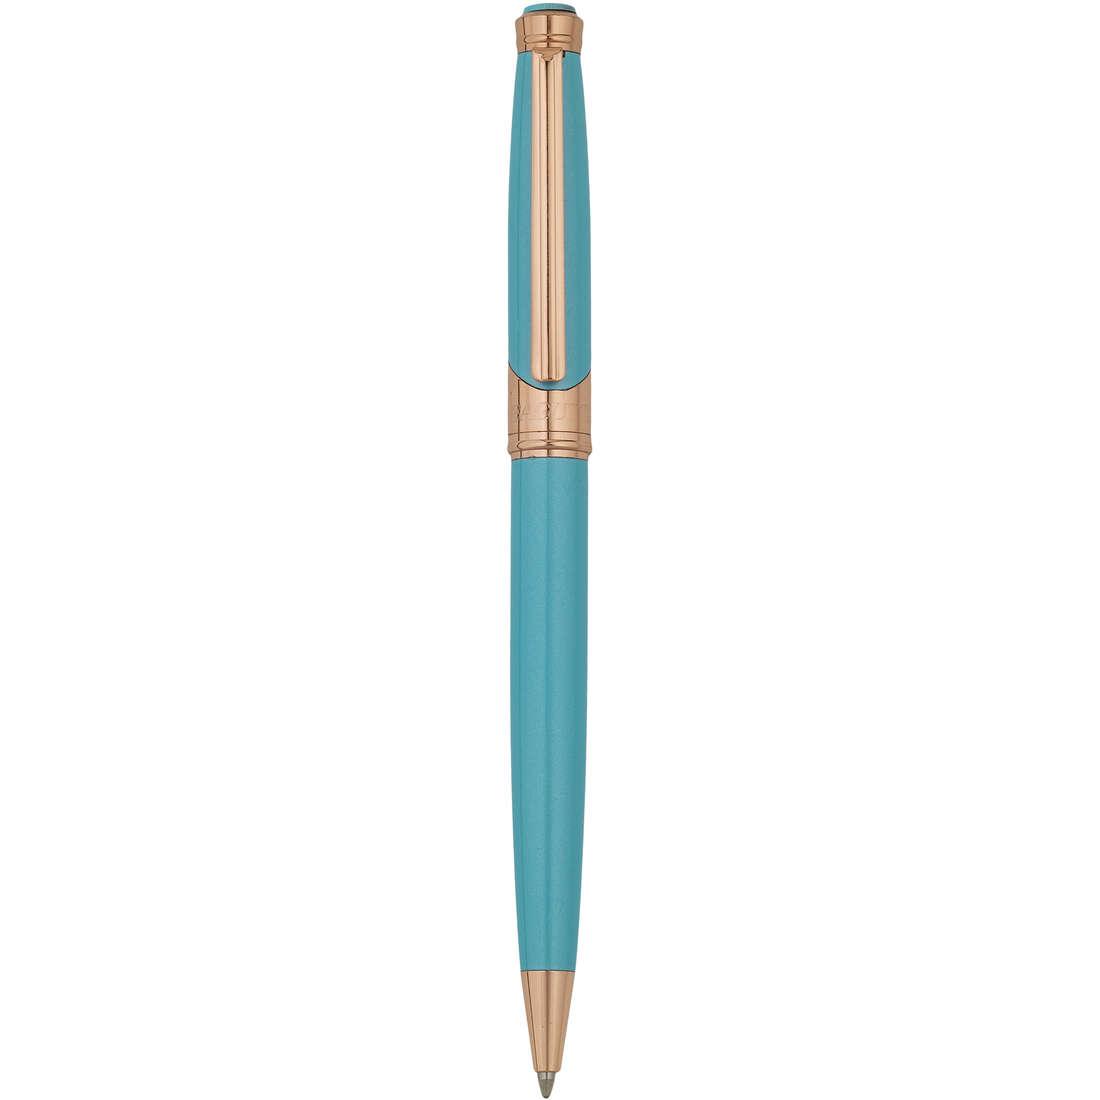 penna unisex gioielli Bagutta H 6009-02 B